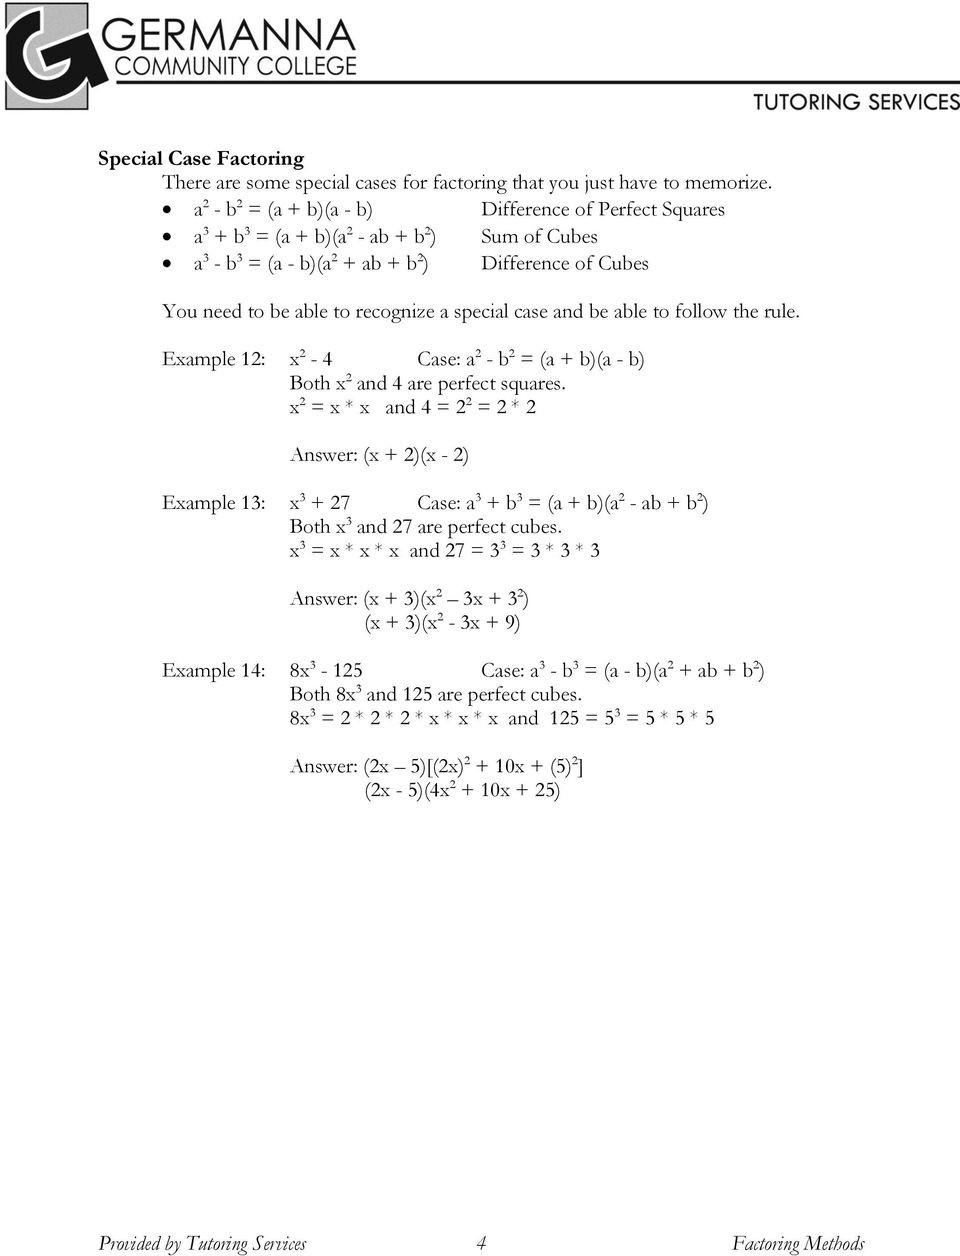 Factoring Special Cases Worksheet Factoring Methods Example 1 2x X 2 1 2 X 1 Pdf